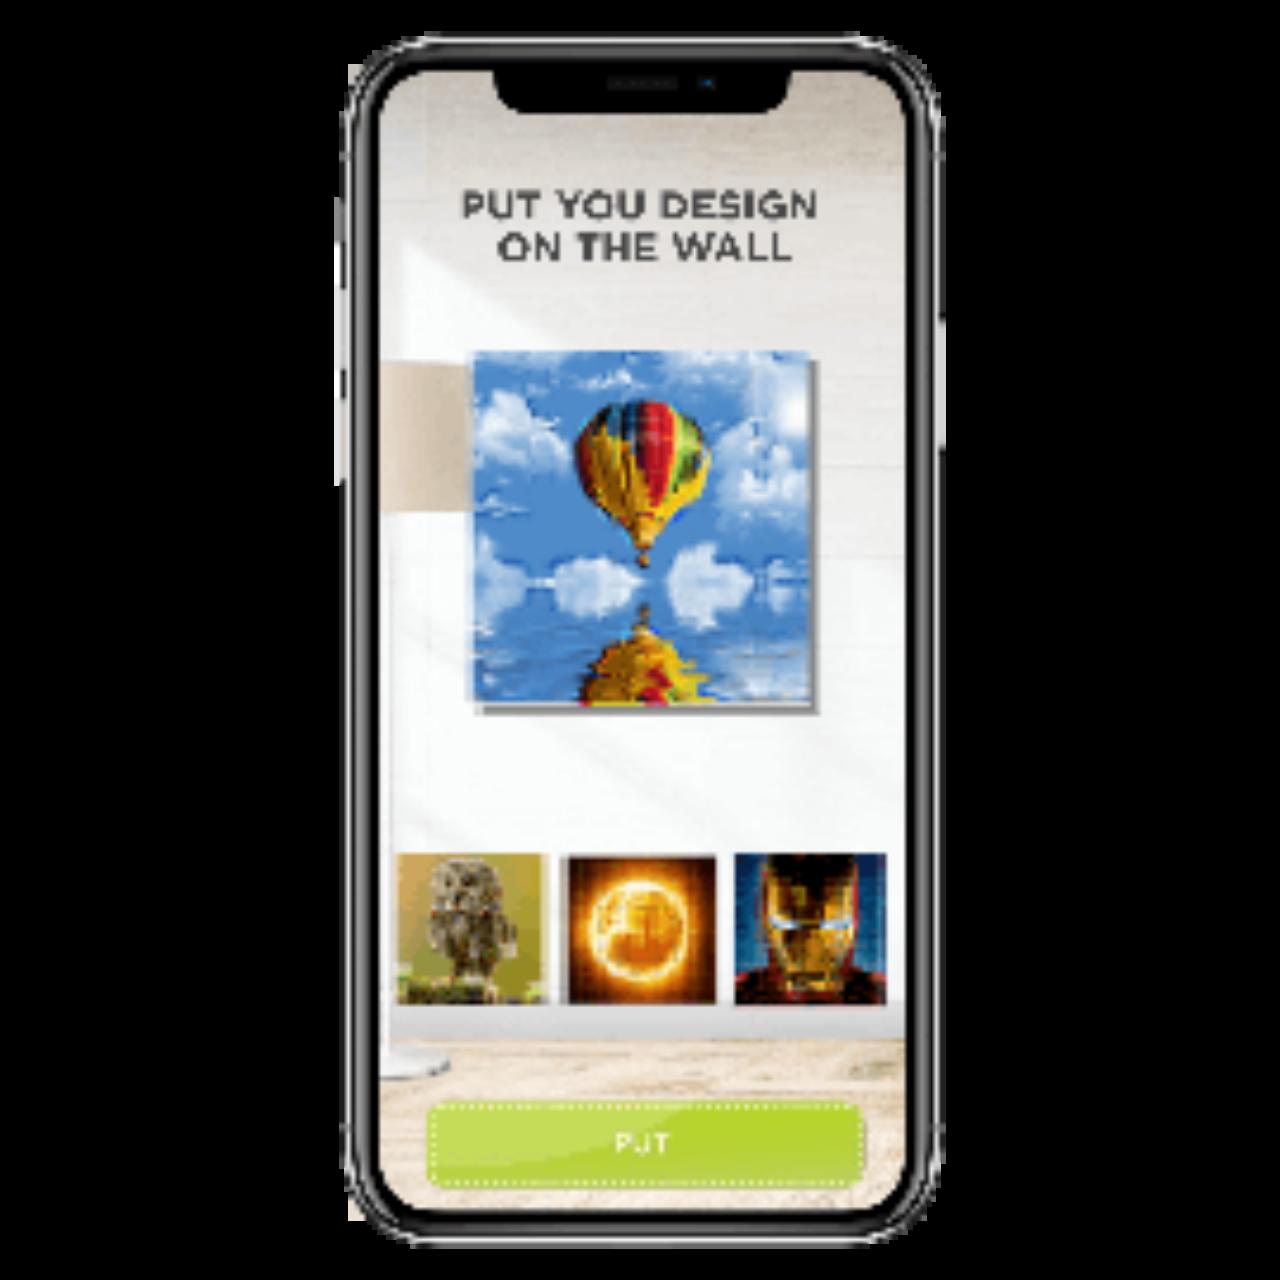 Coloring book app - baloon